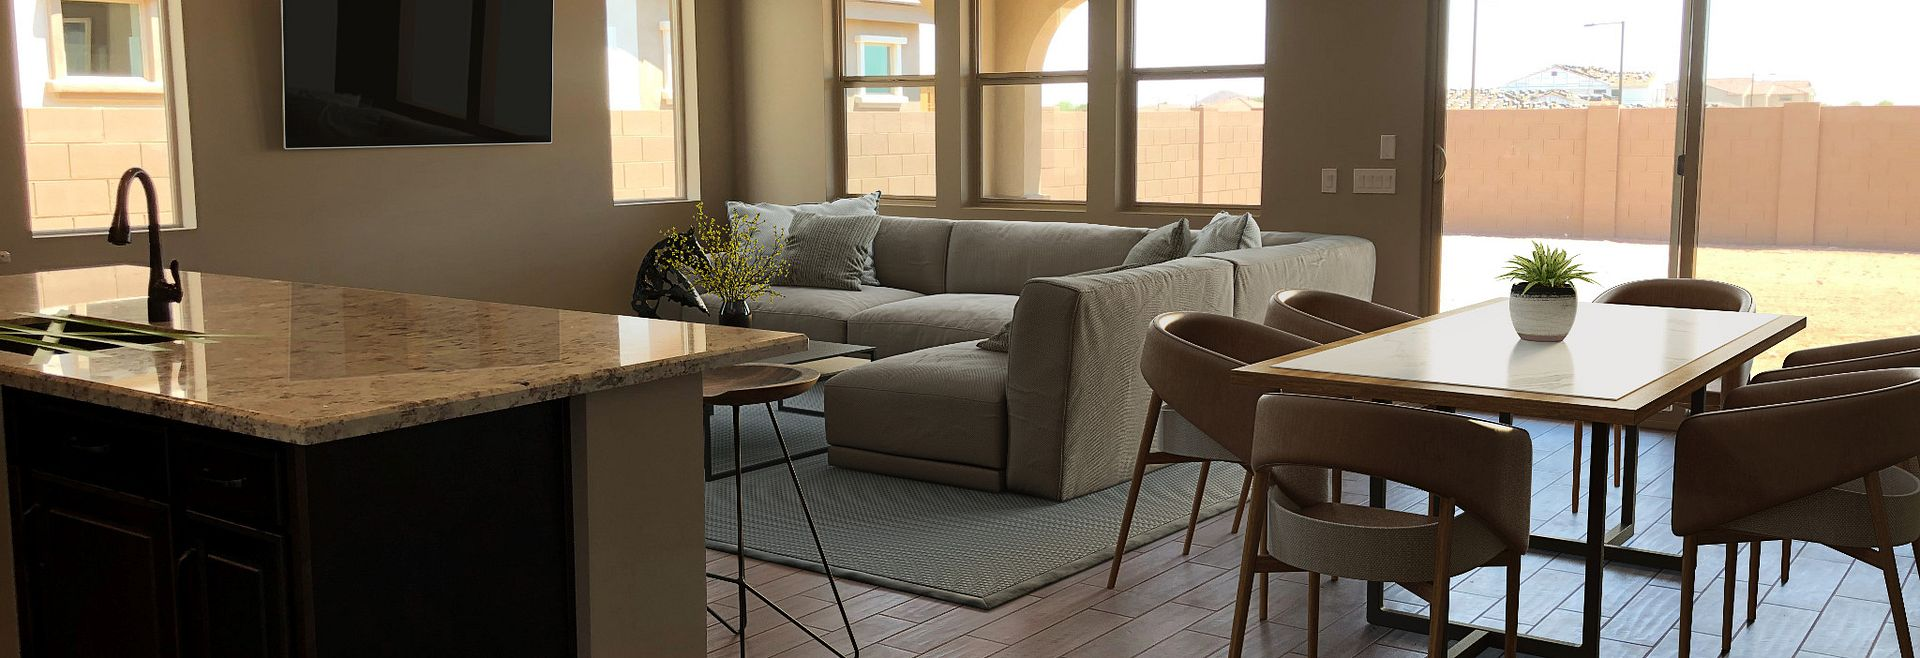 Ascent Aloravita Homesite 21 Great Room